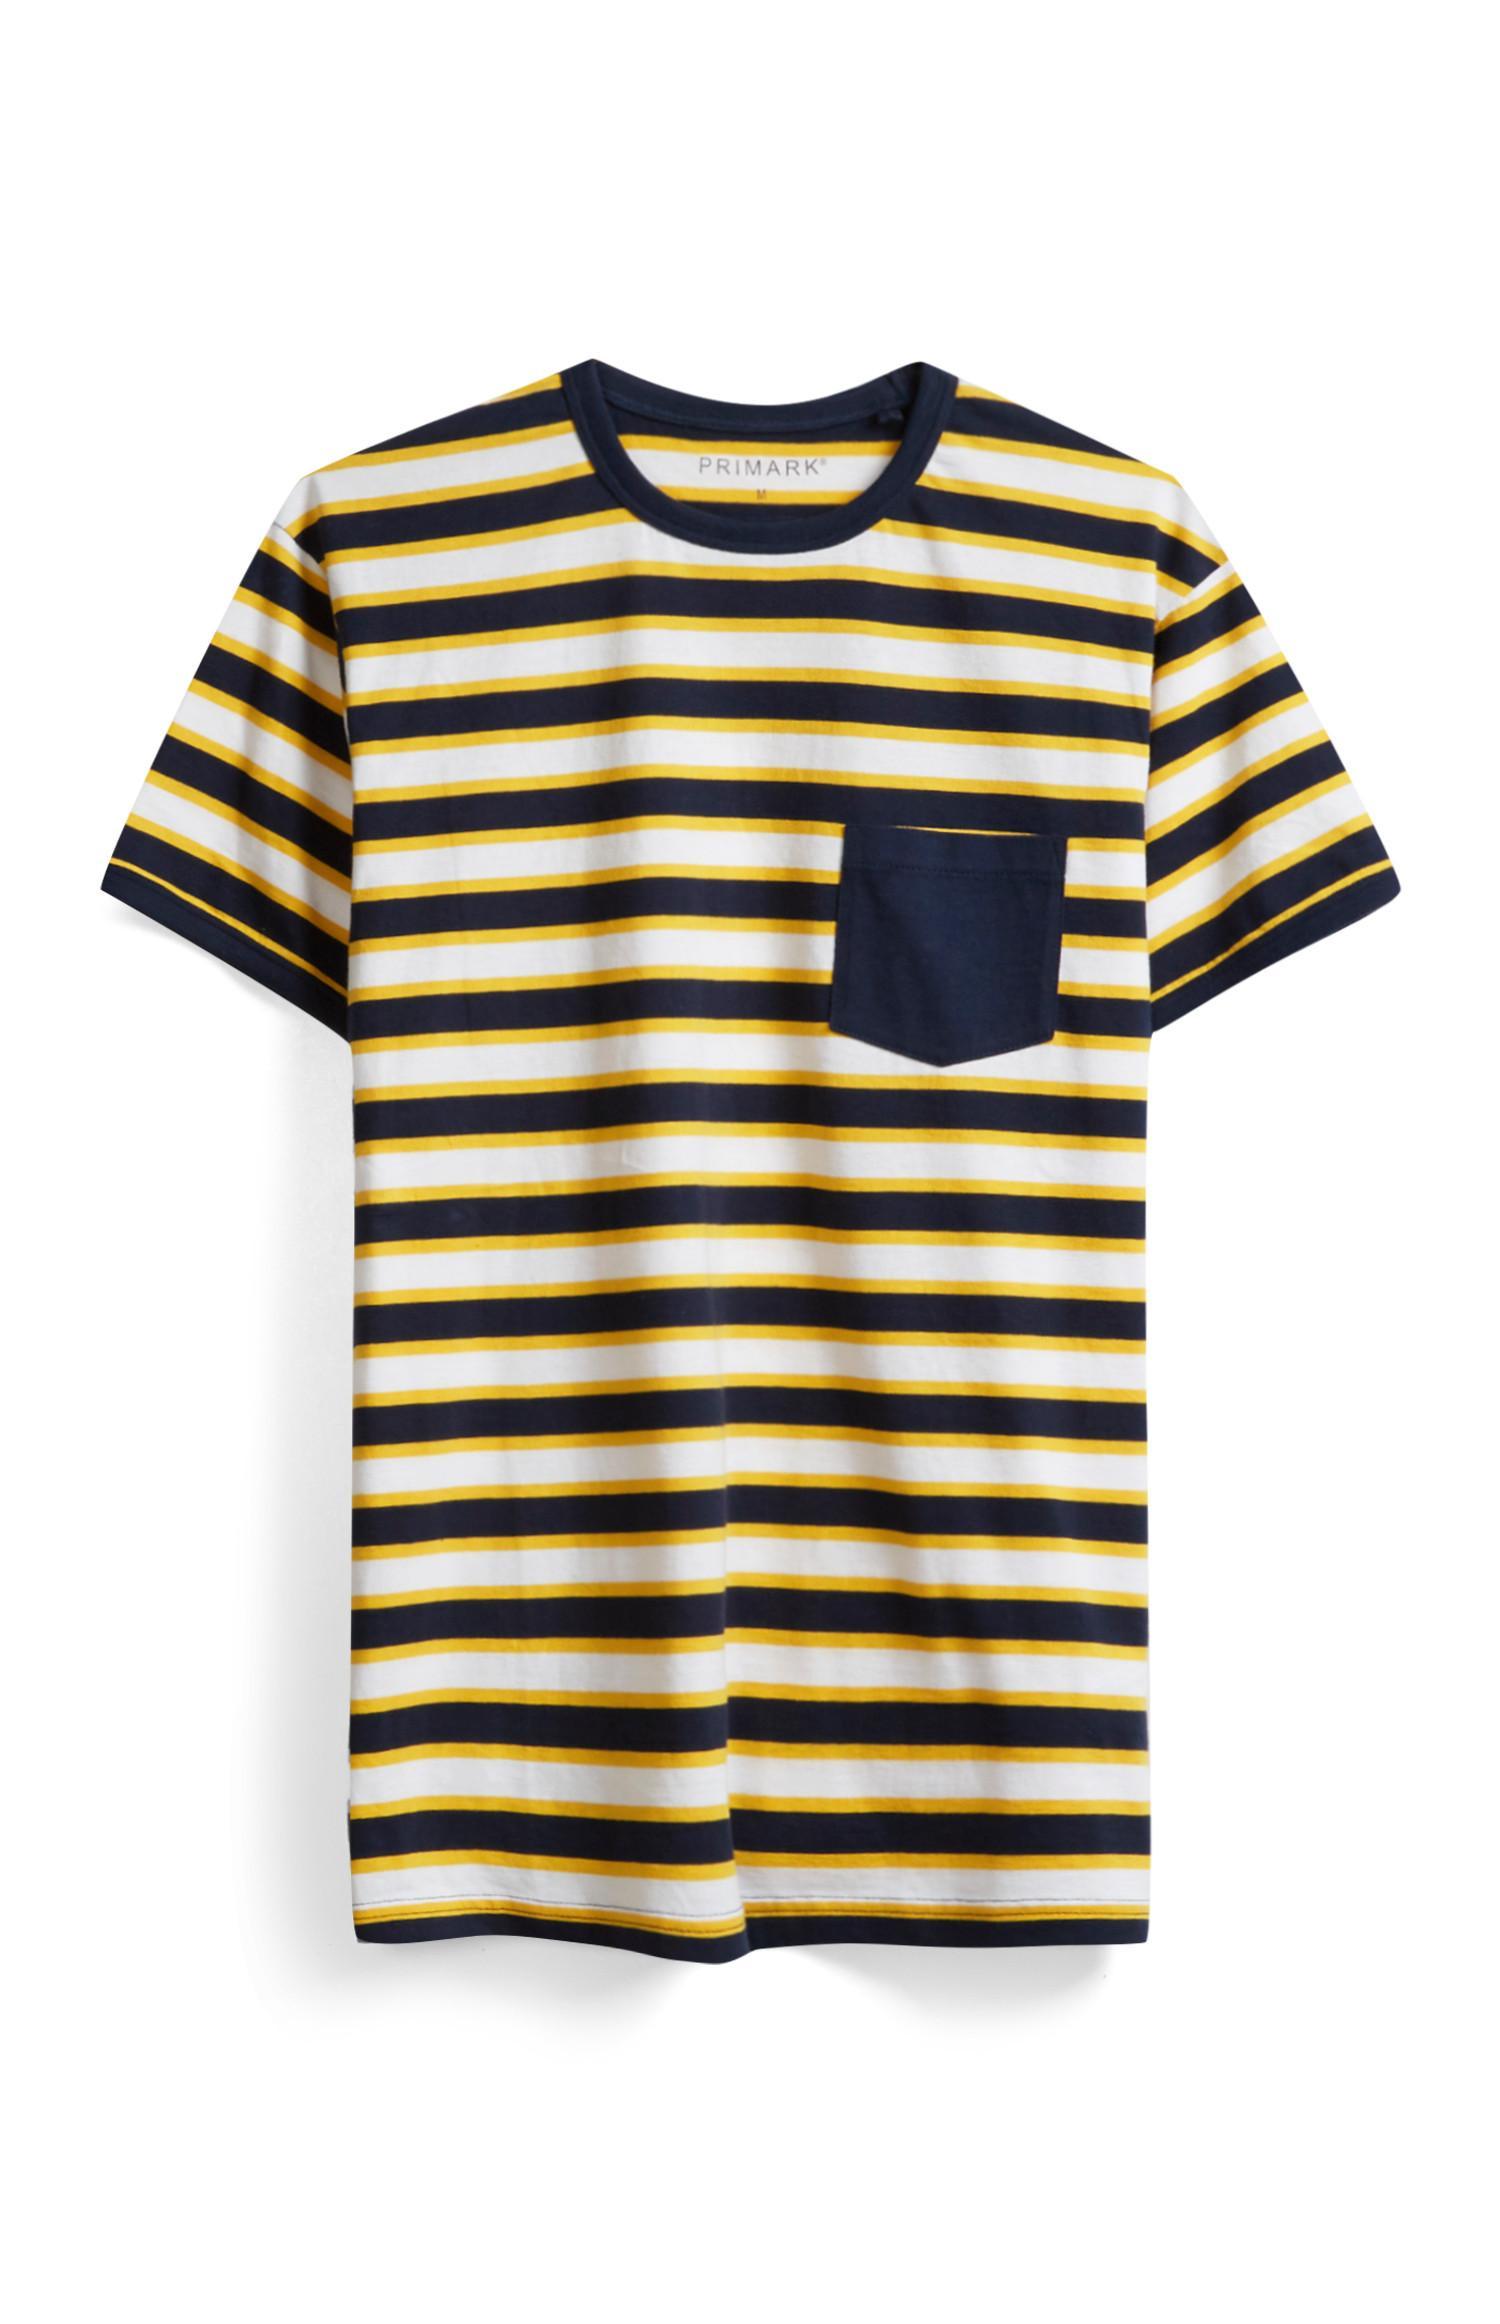 Gelb-marineblau gestreiftes T-Shirt